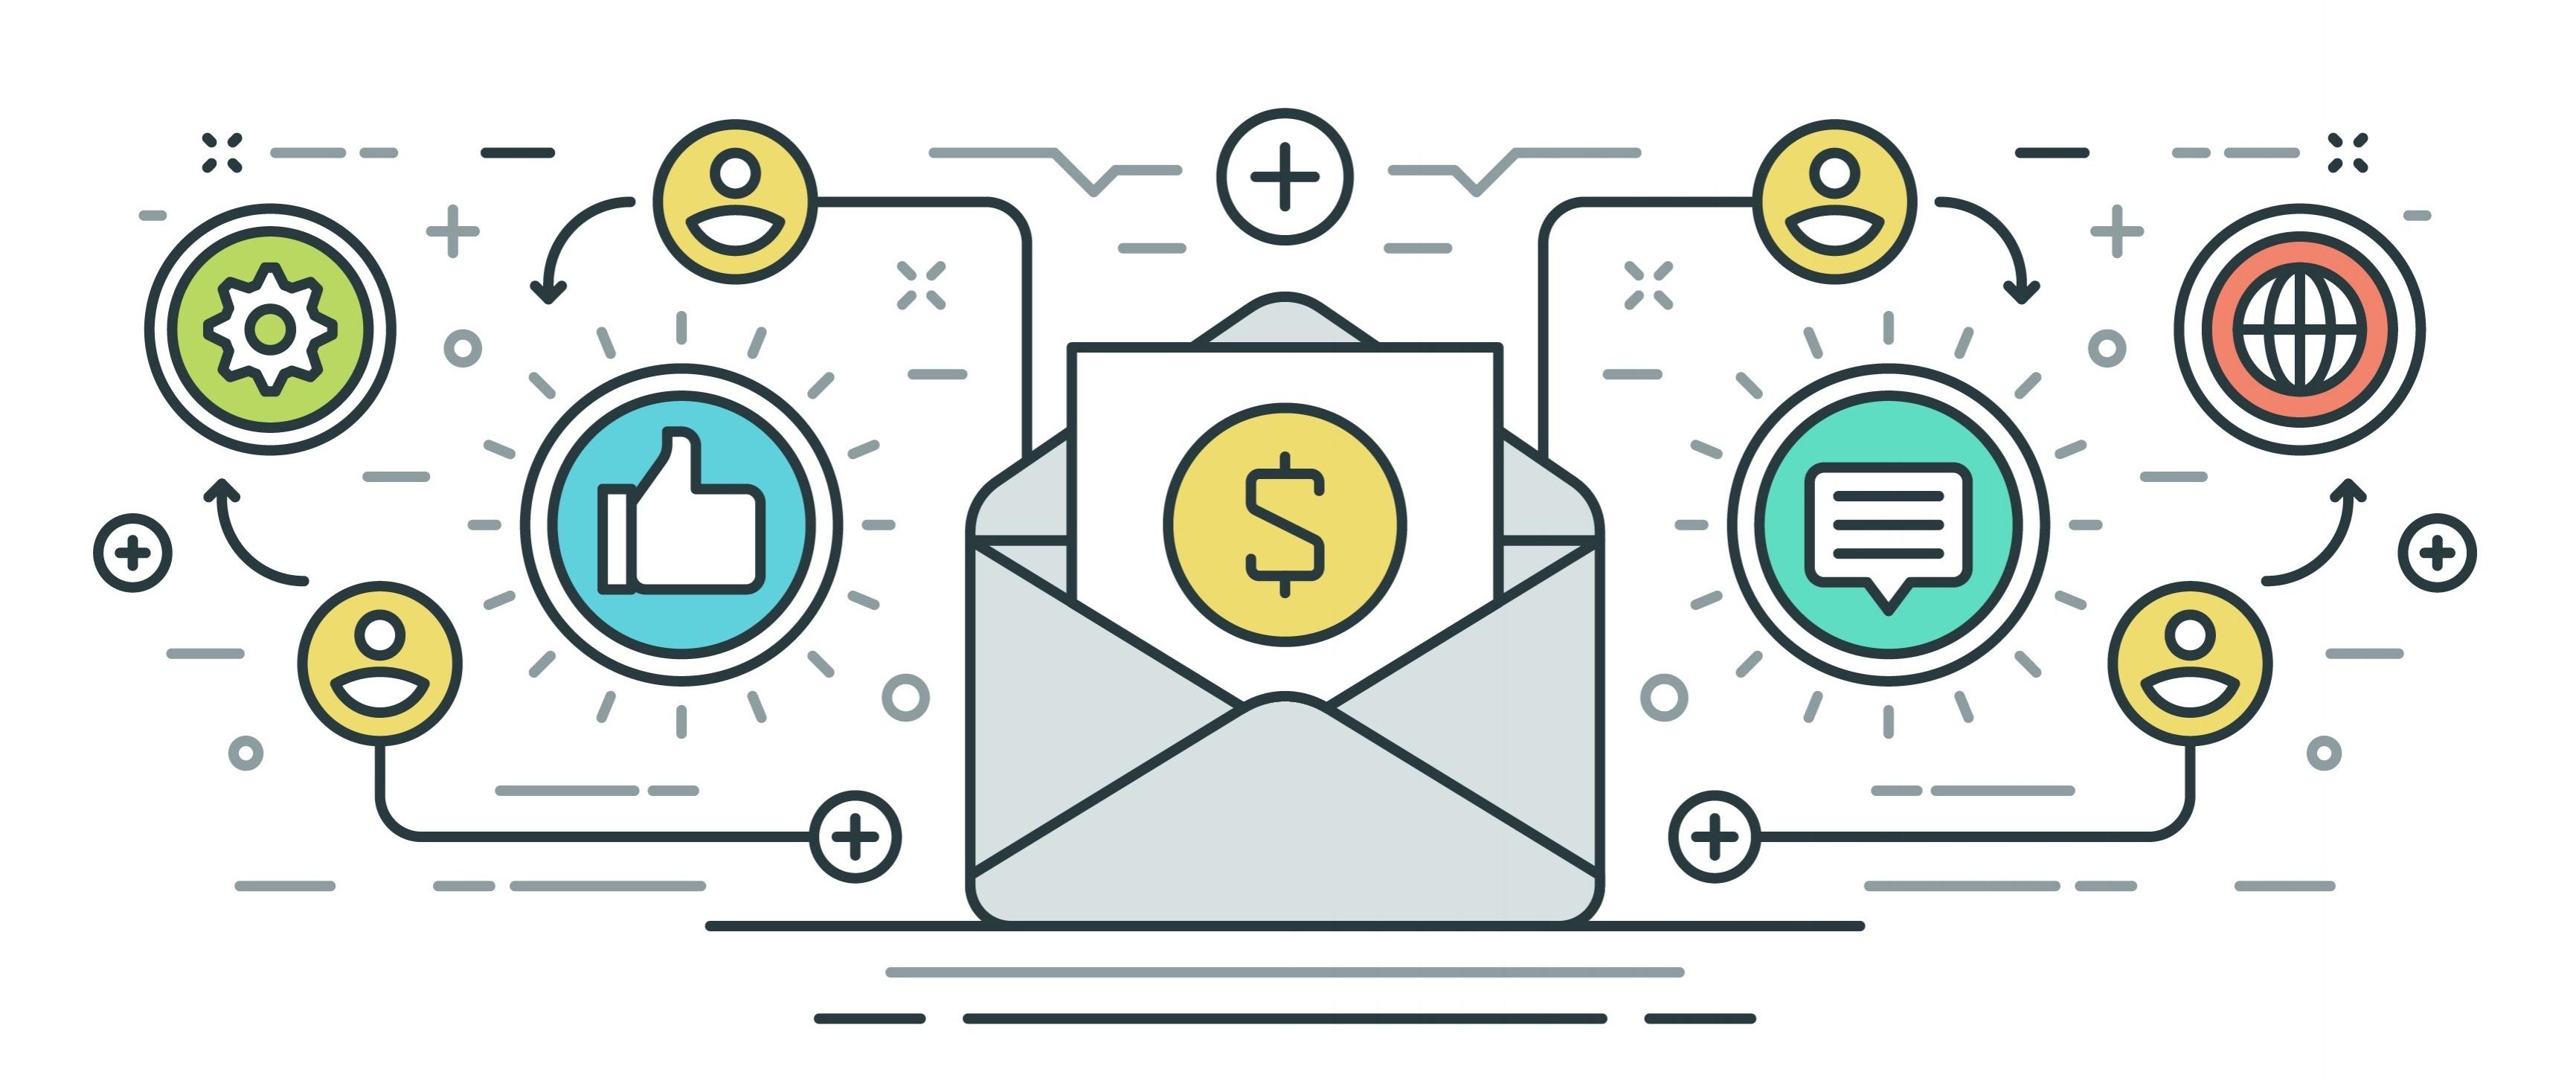 Email_Marketing_Automation_a.jpeg